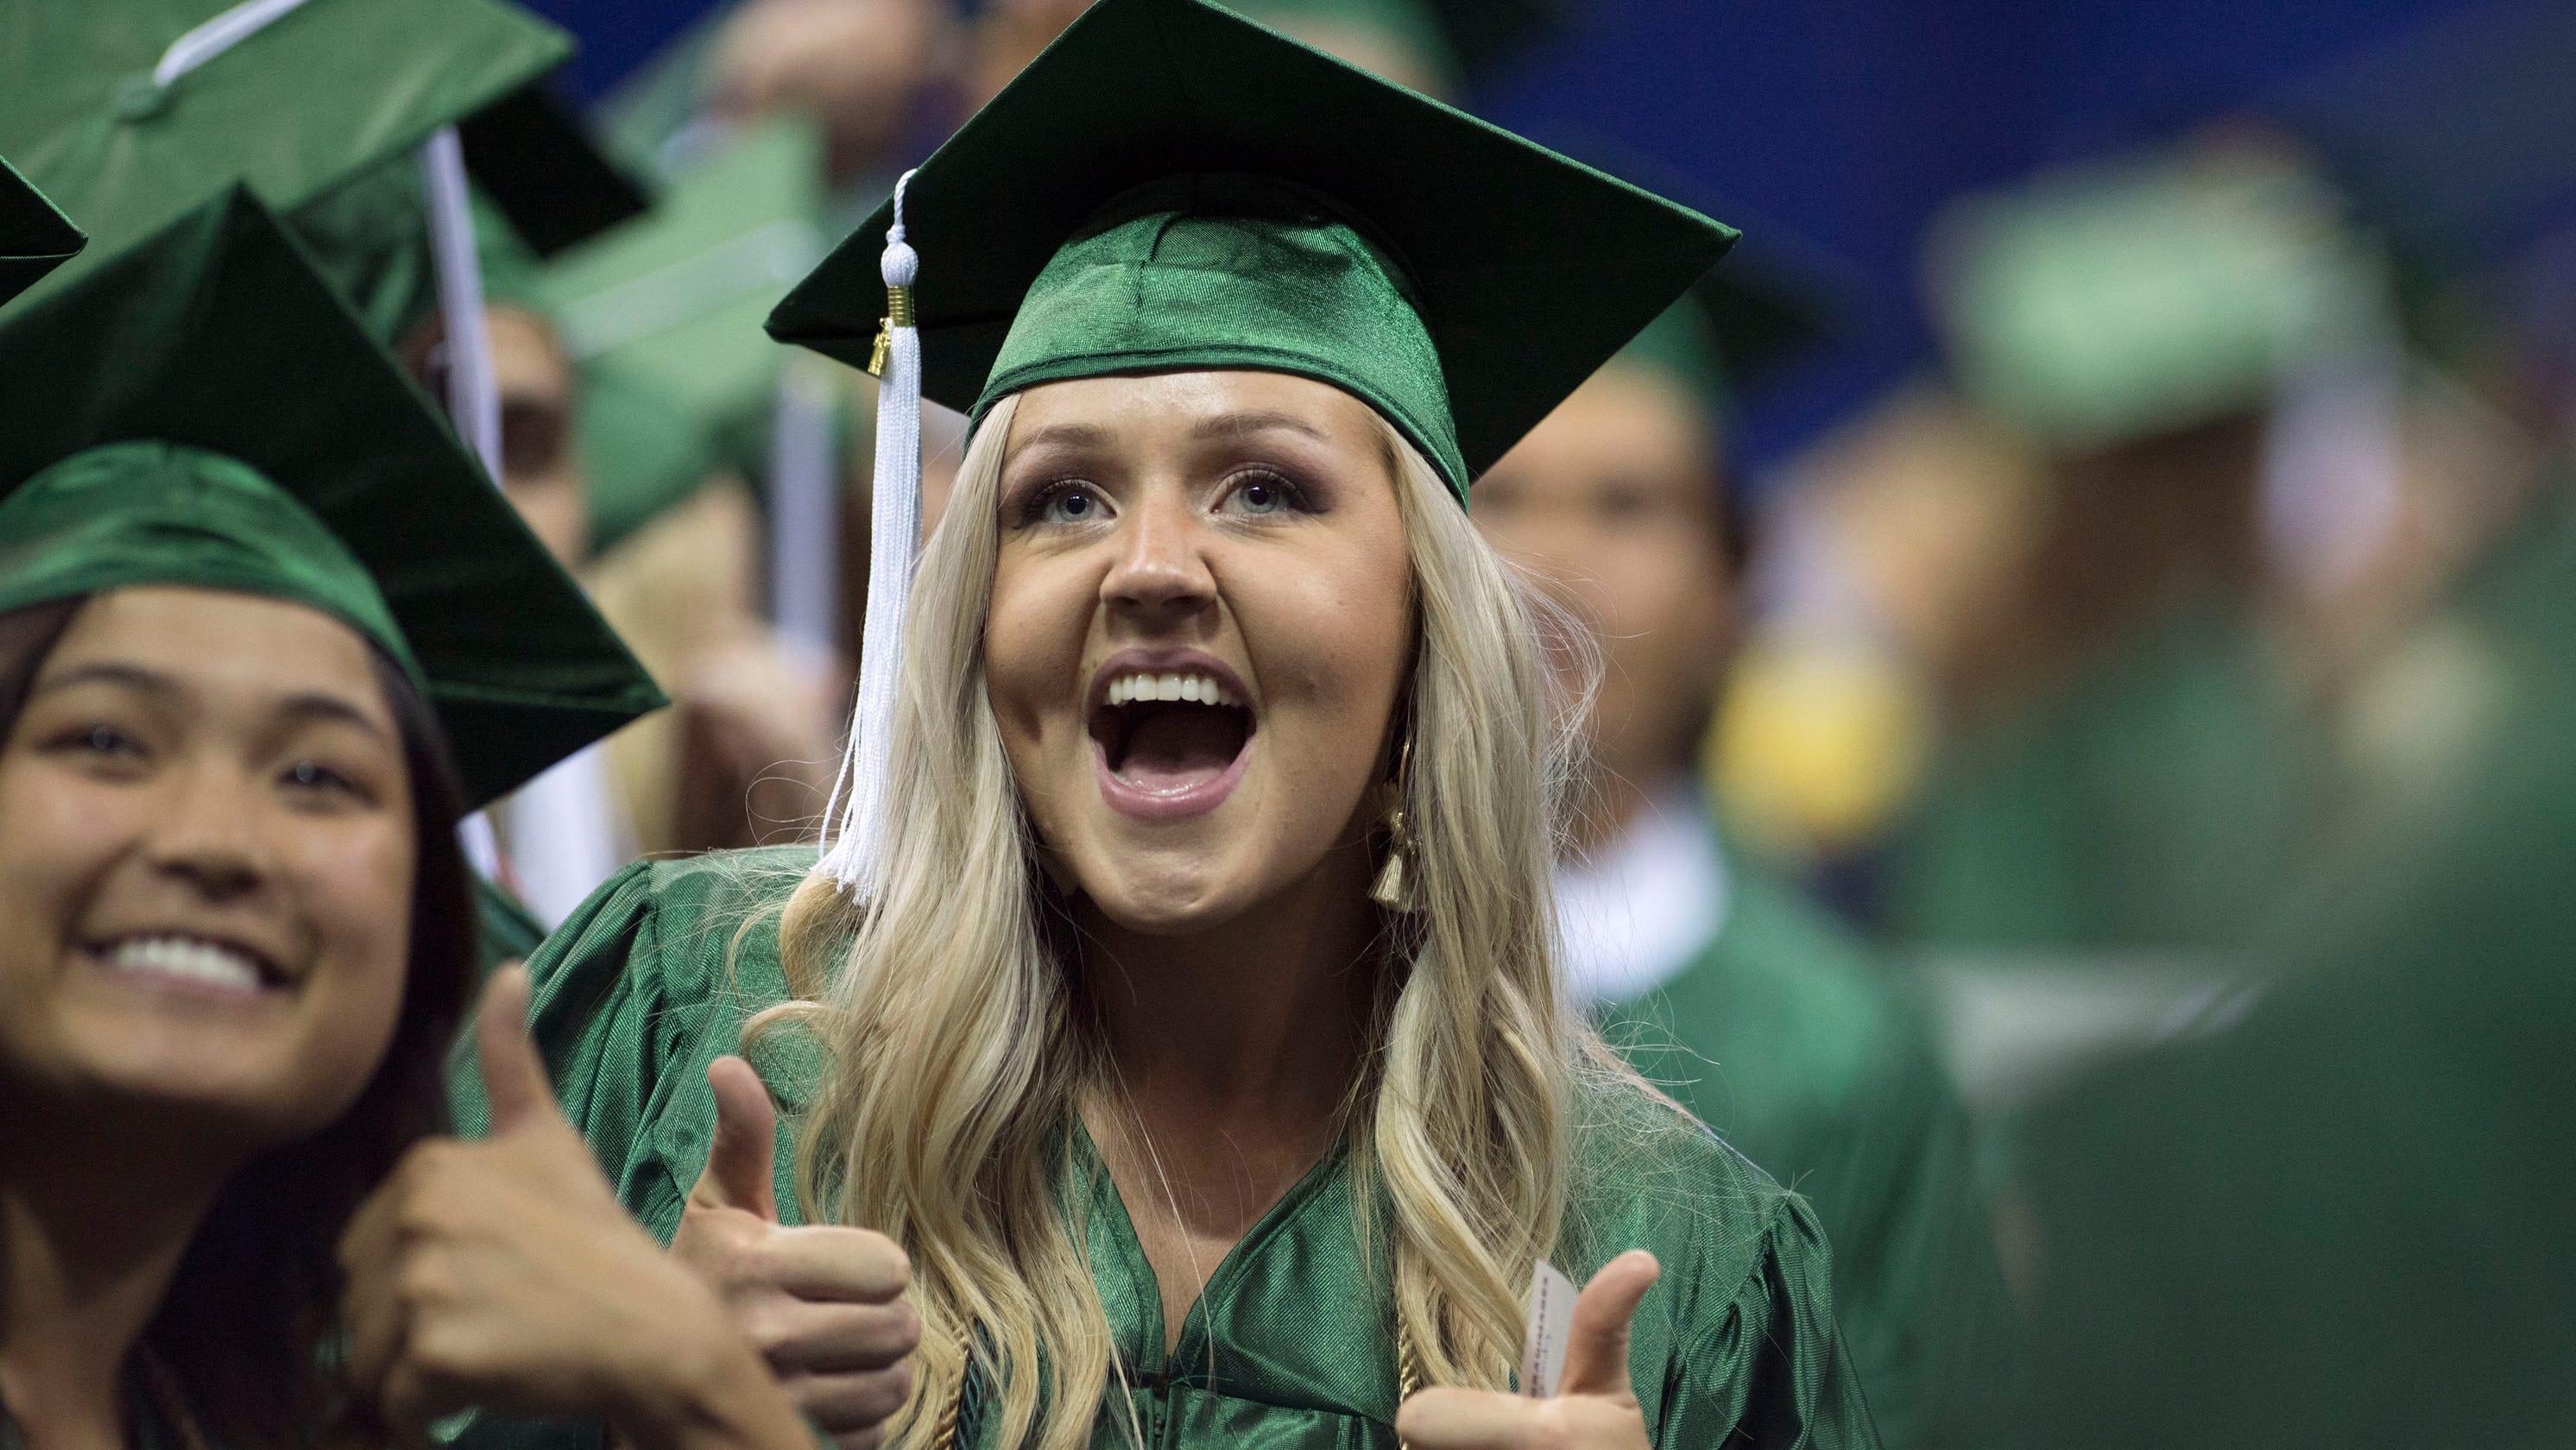 Uwf Spring Break 2020.Psc Uwf Rank Top Regional Schools On U S News World